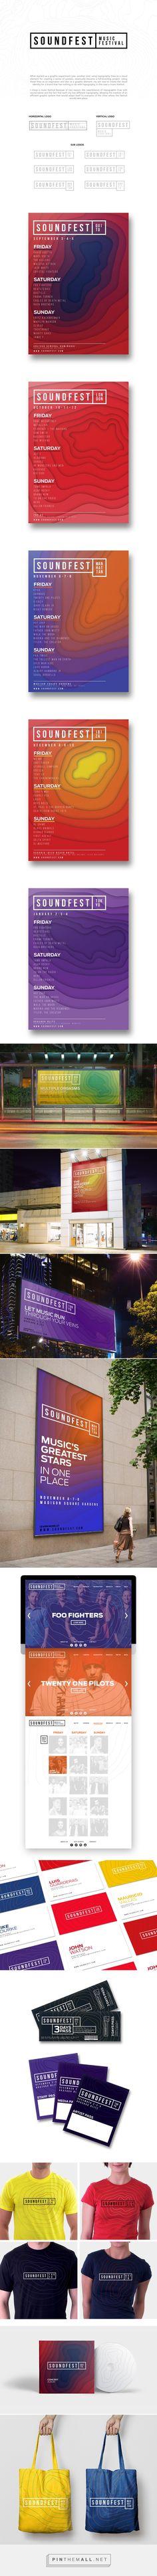 SOUNDFEST Music Festival visual identity on Behance - created via https://pinthemall.net